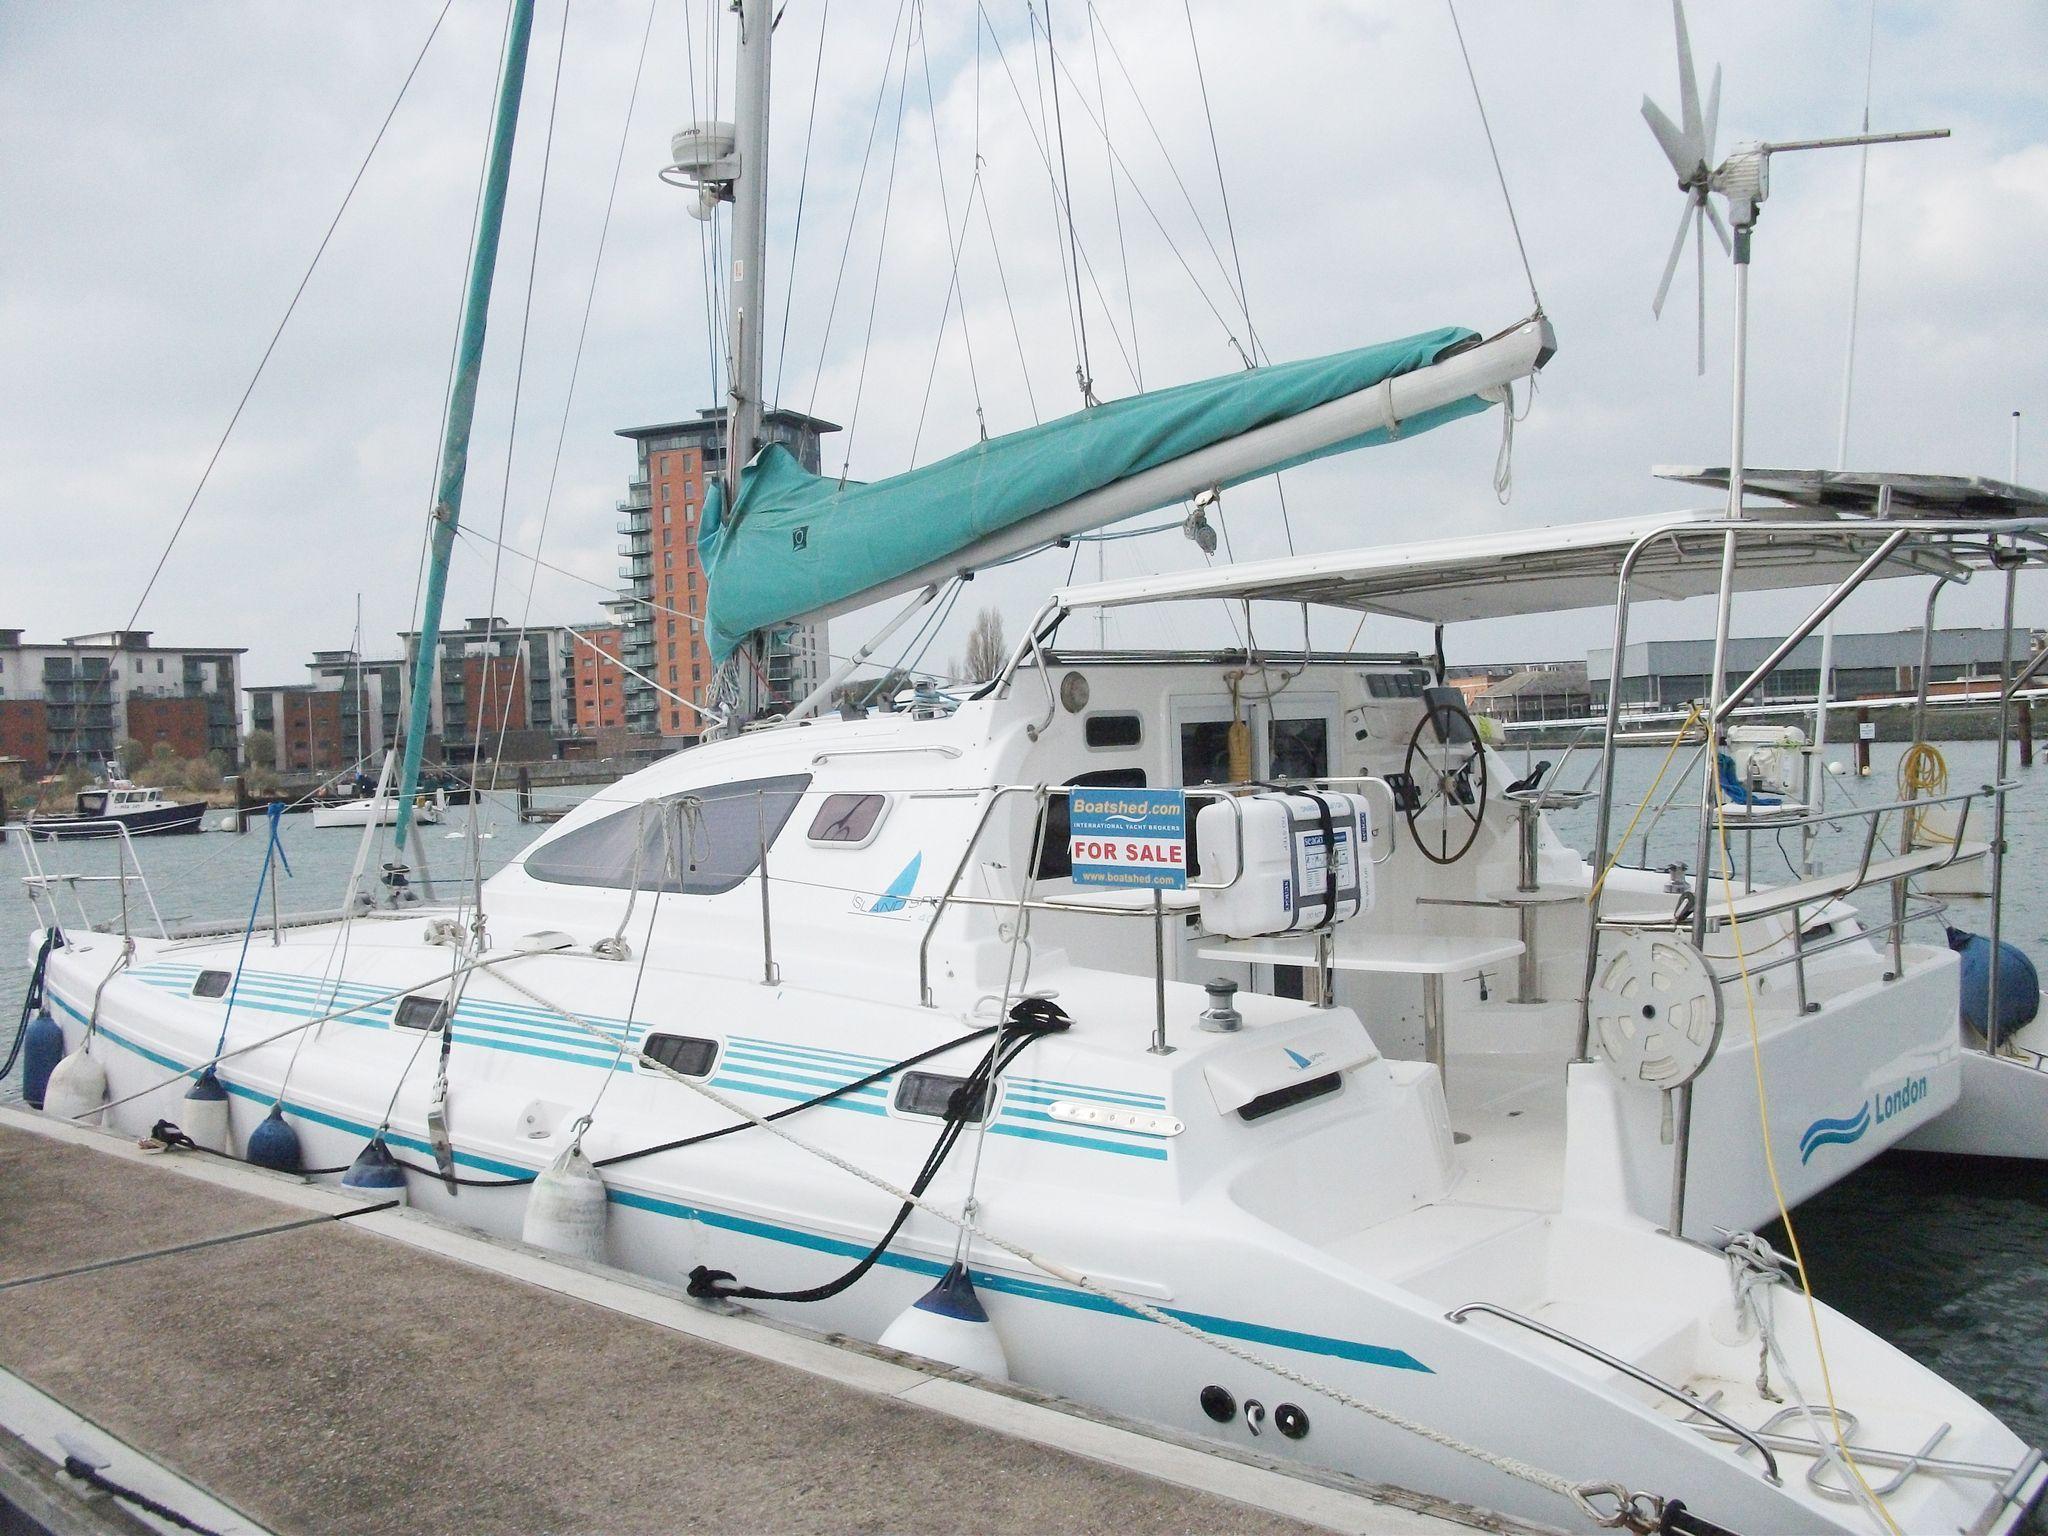 Island Spirit 400